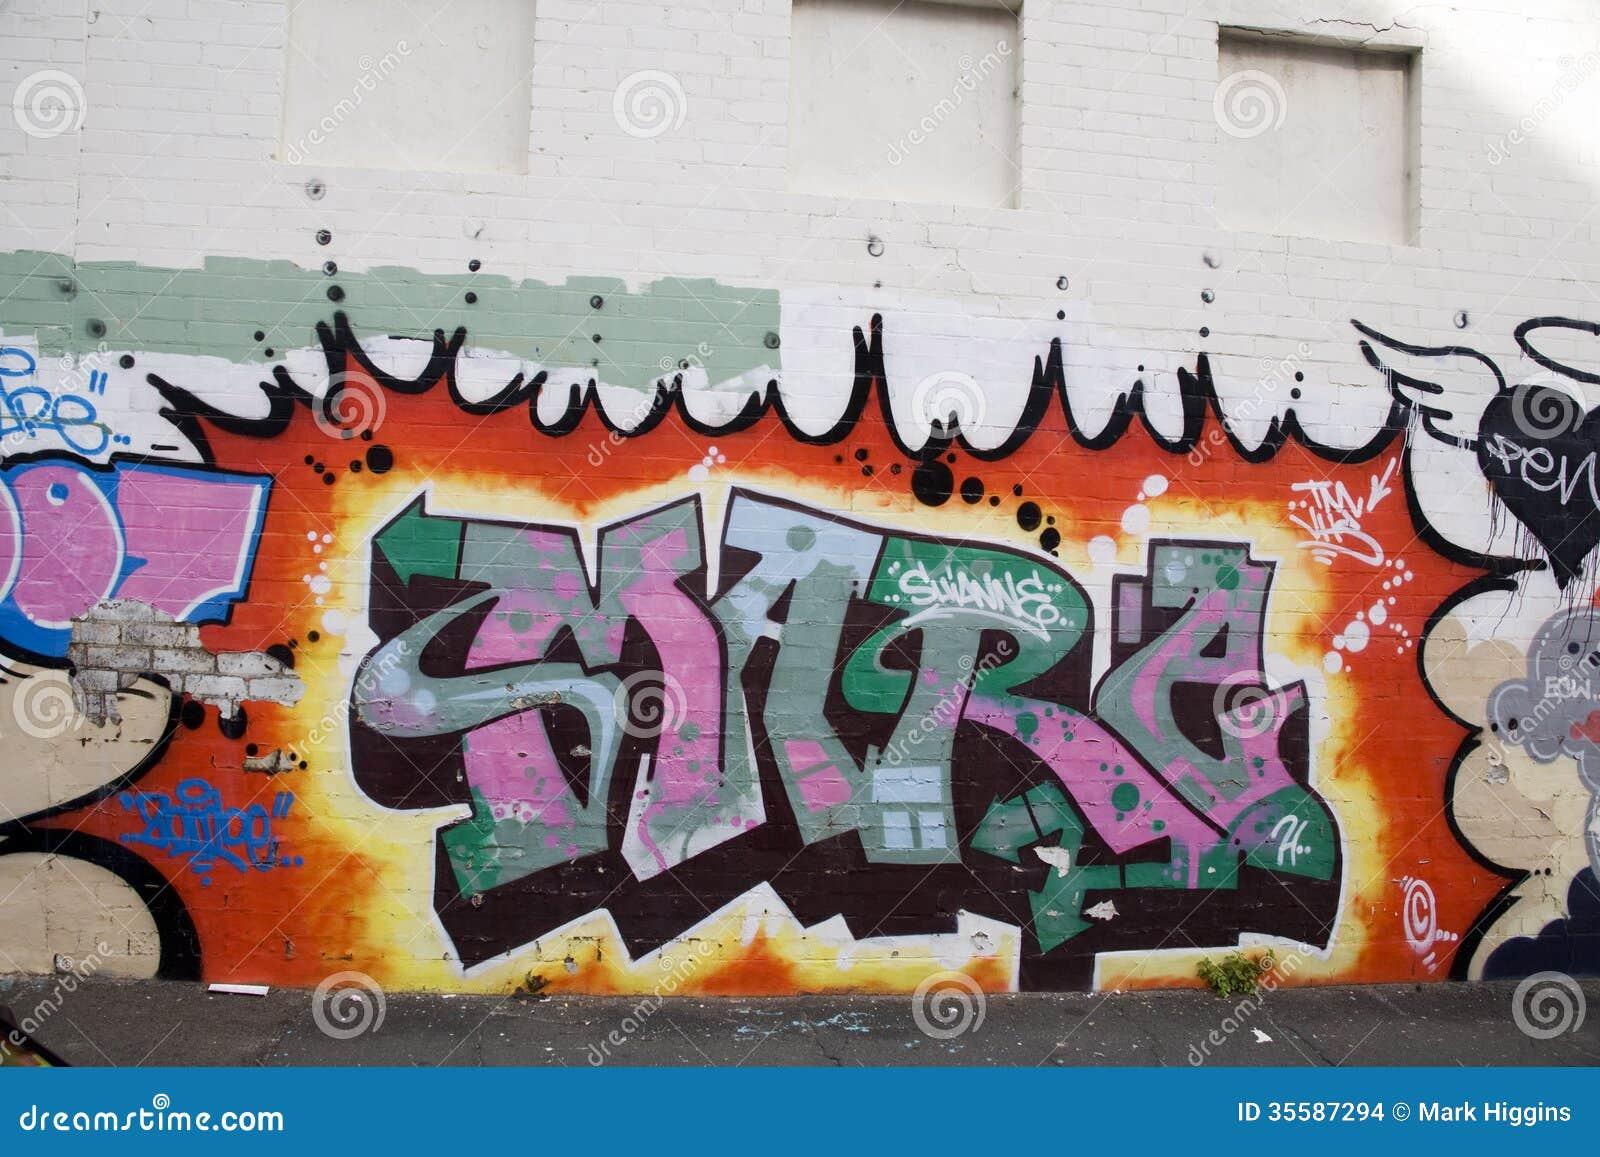 graffitti stock photo image of arts building background 35587294